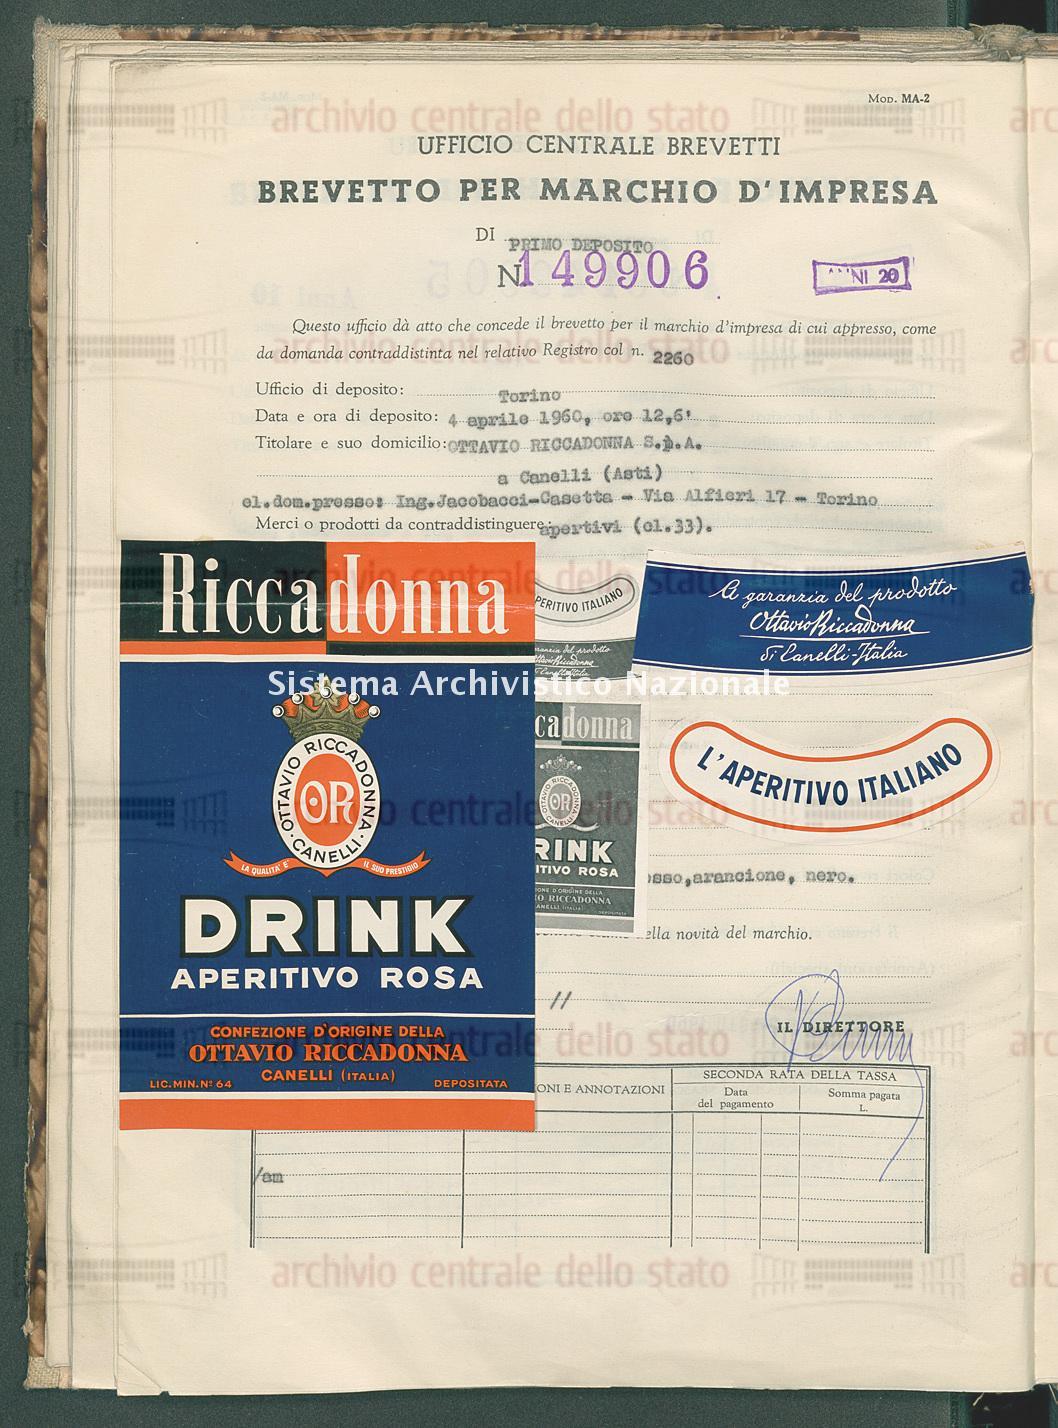 Aperitivi Ottavio Riccadonna S.P.A. (27/06/1960)